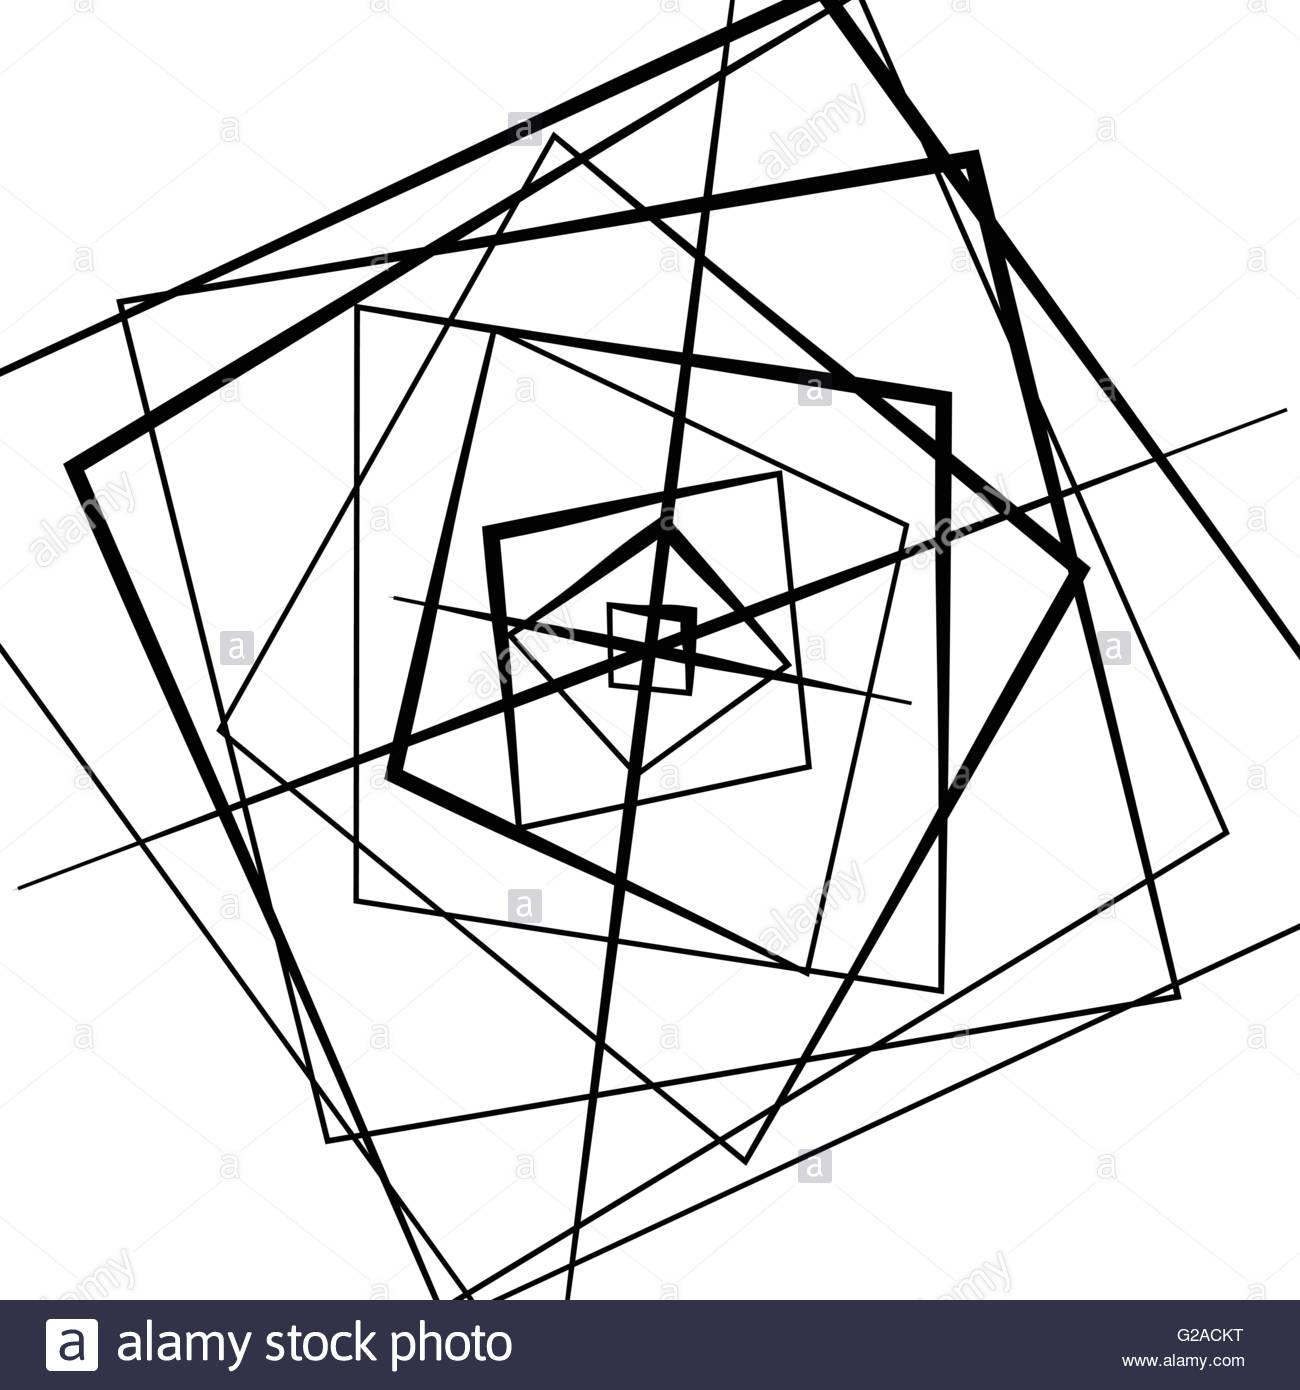 1300x1390 Random Intersecting Lines. Abstract Monochrome Geometric Art Stock